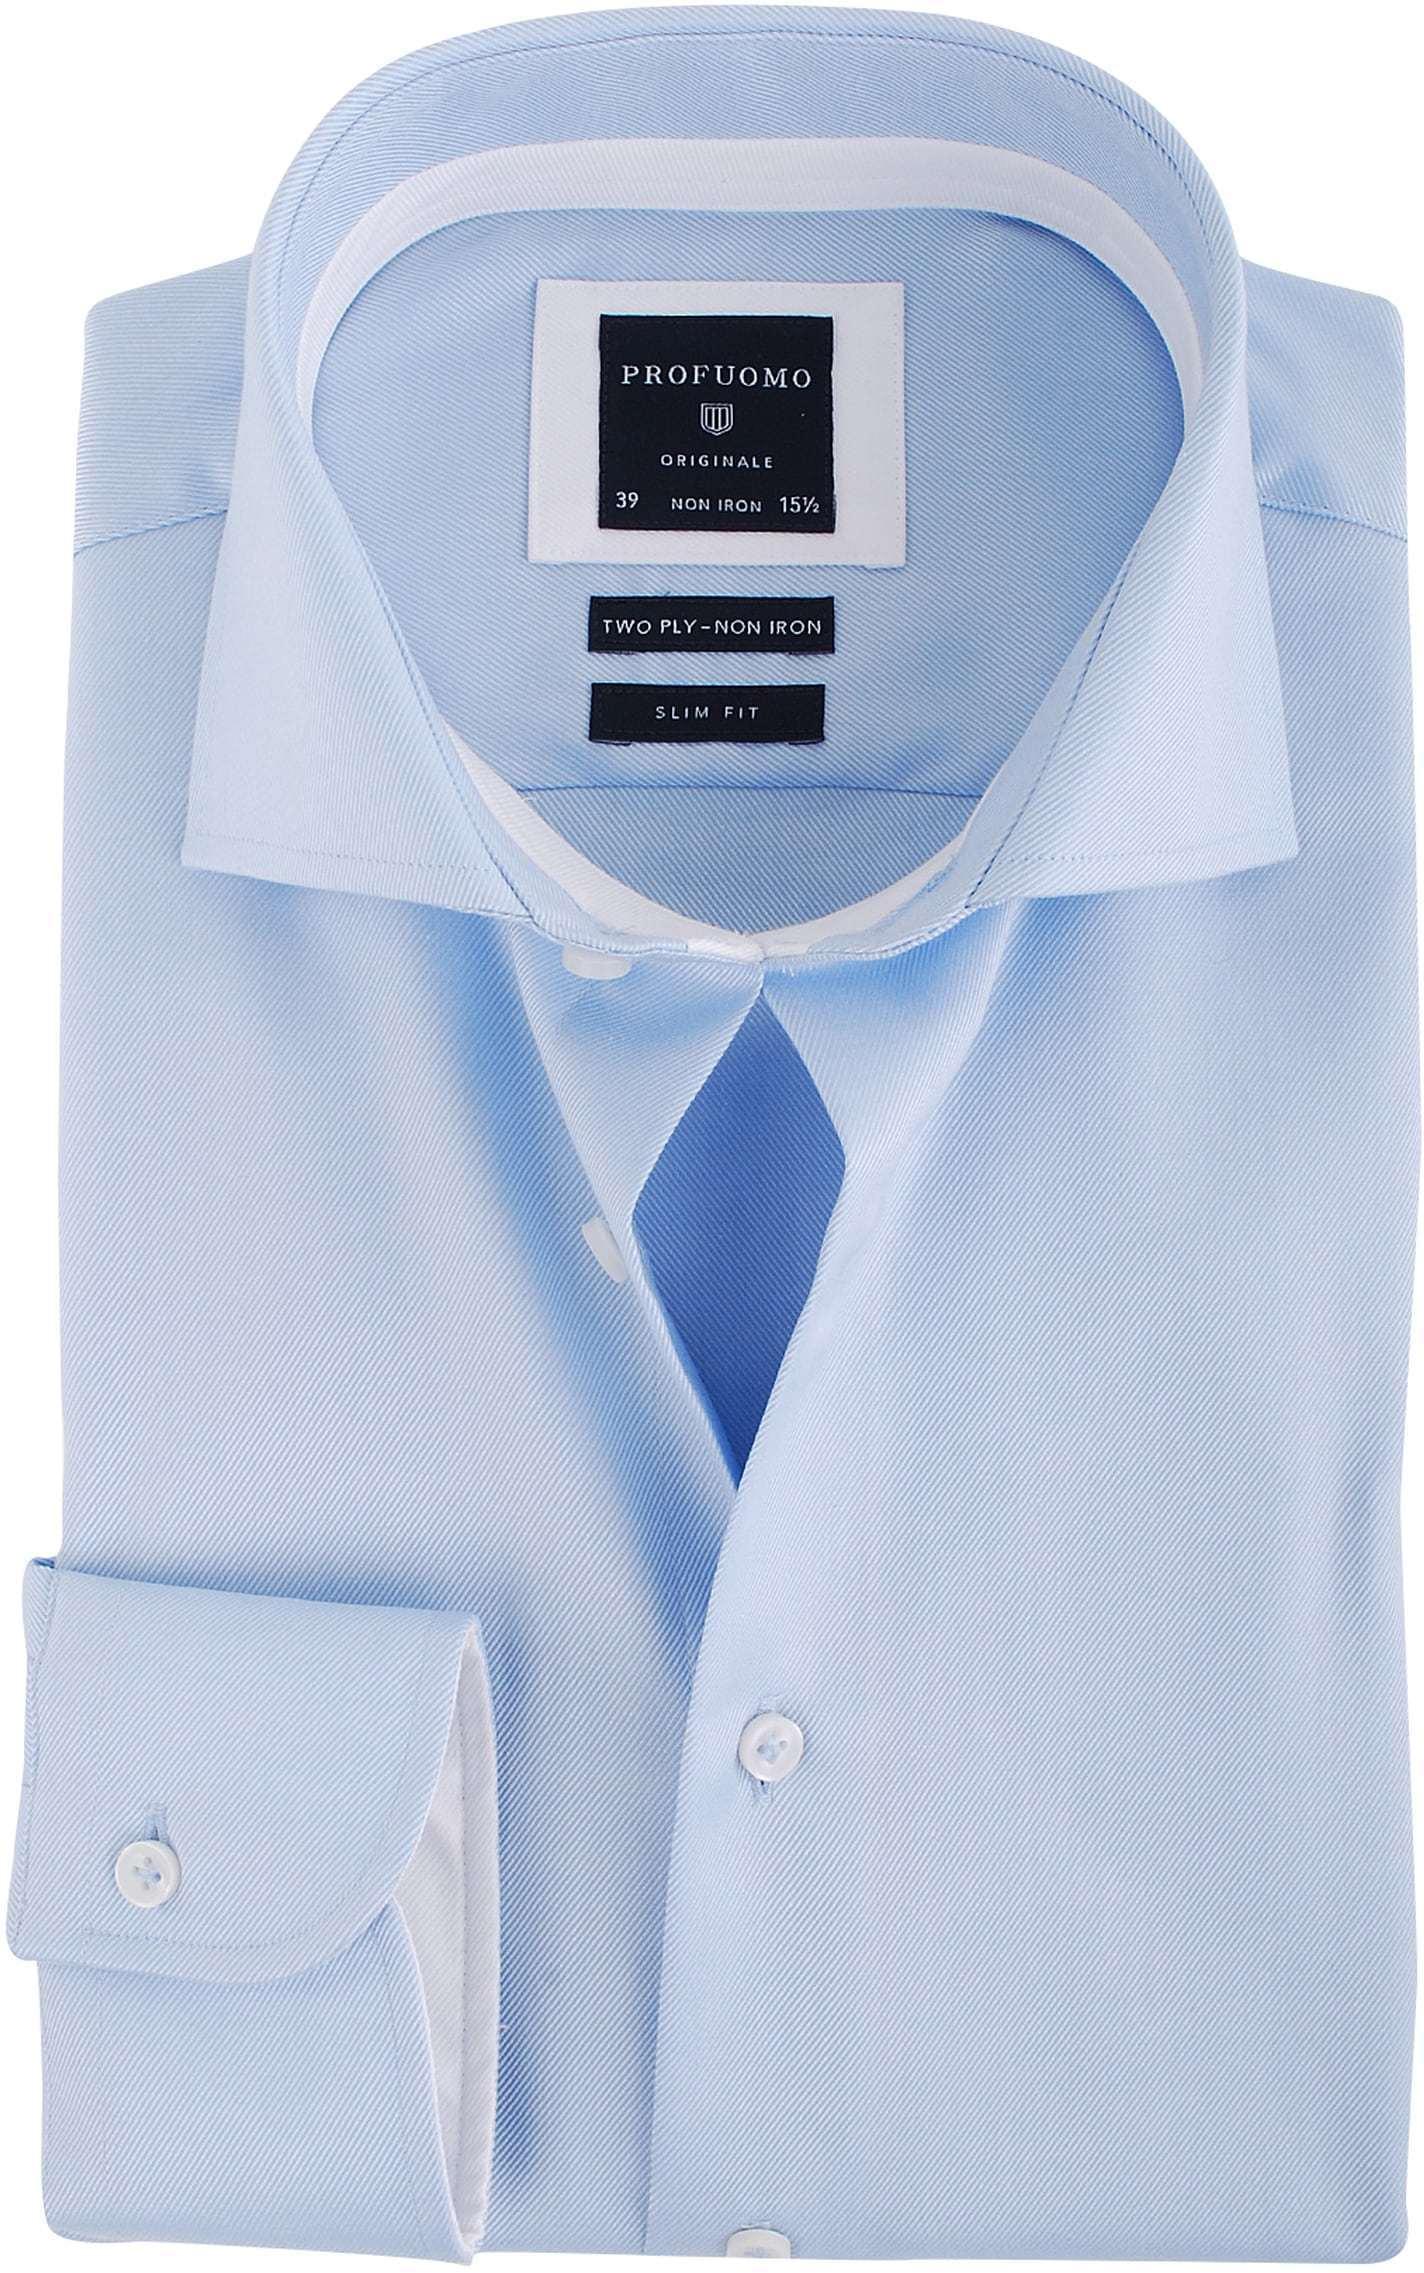 Profuomo Overhemd Blauw + Wit Contrast foto 0